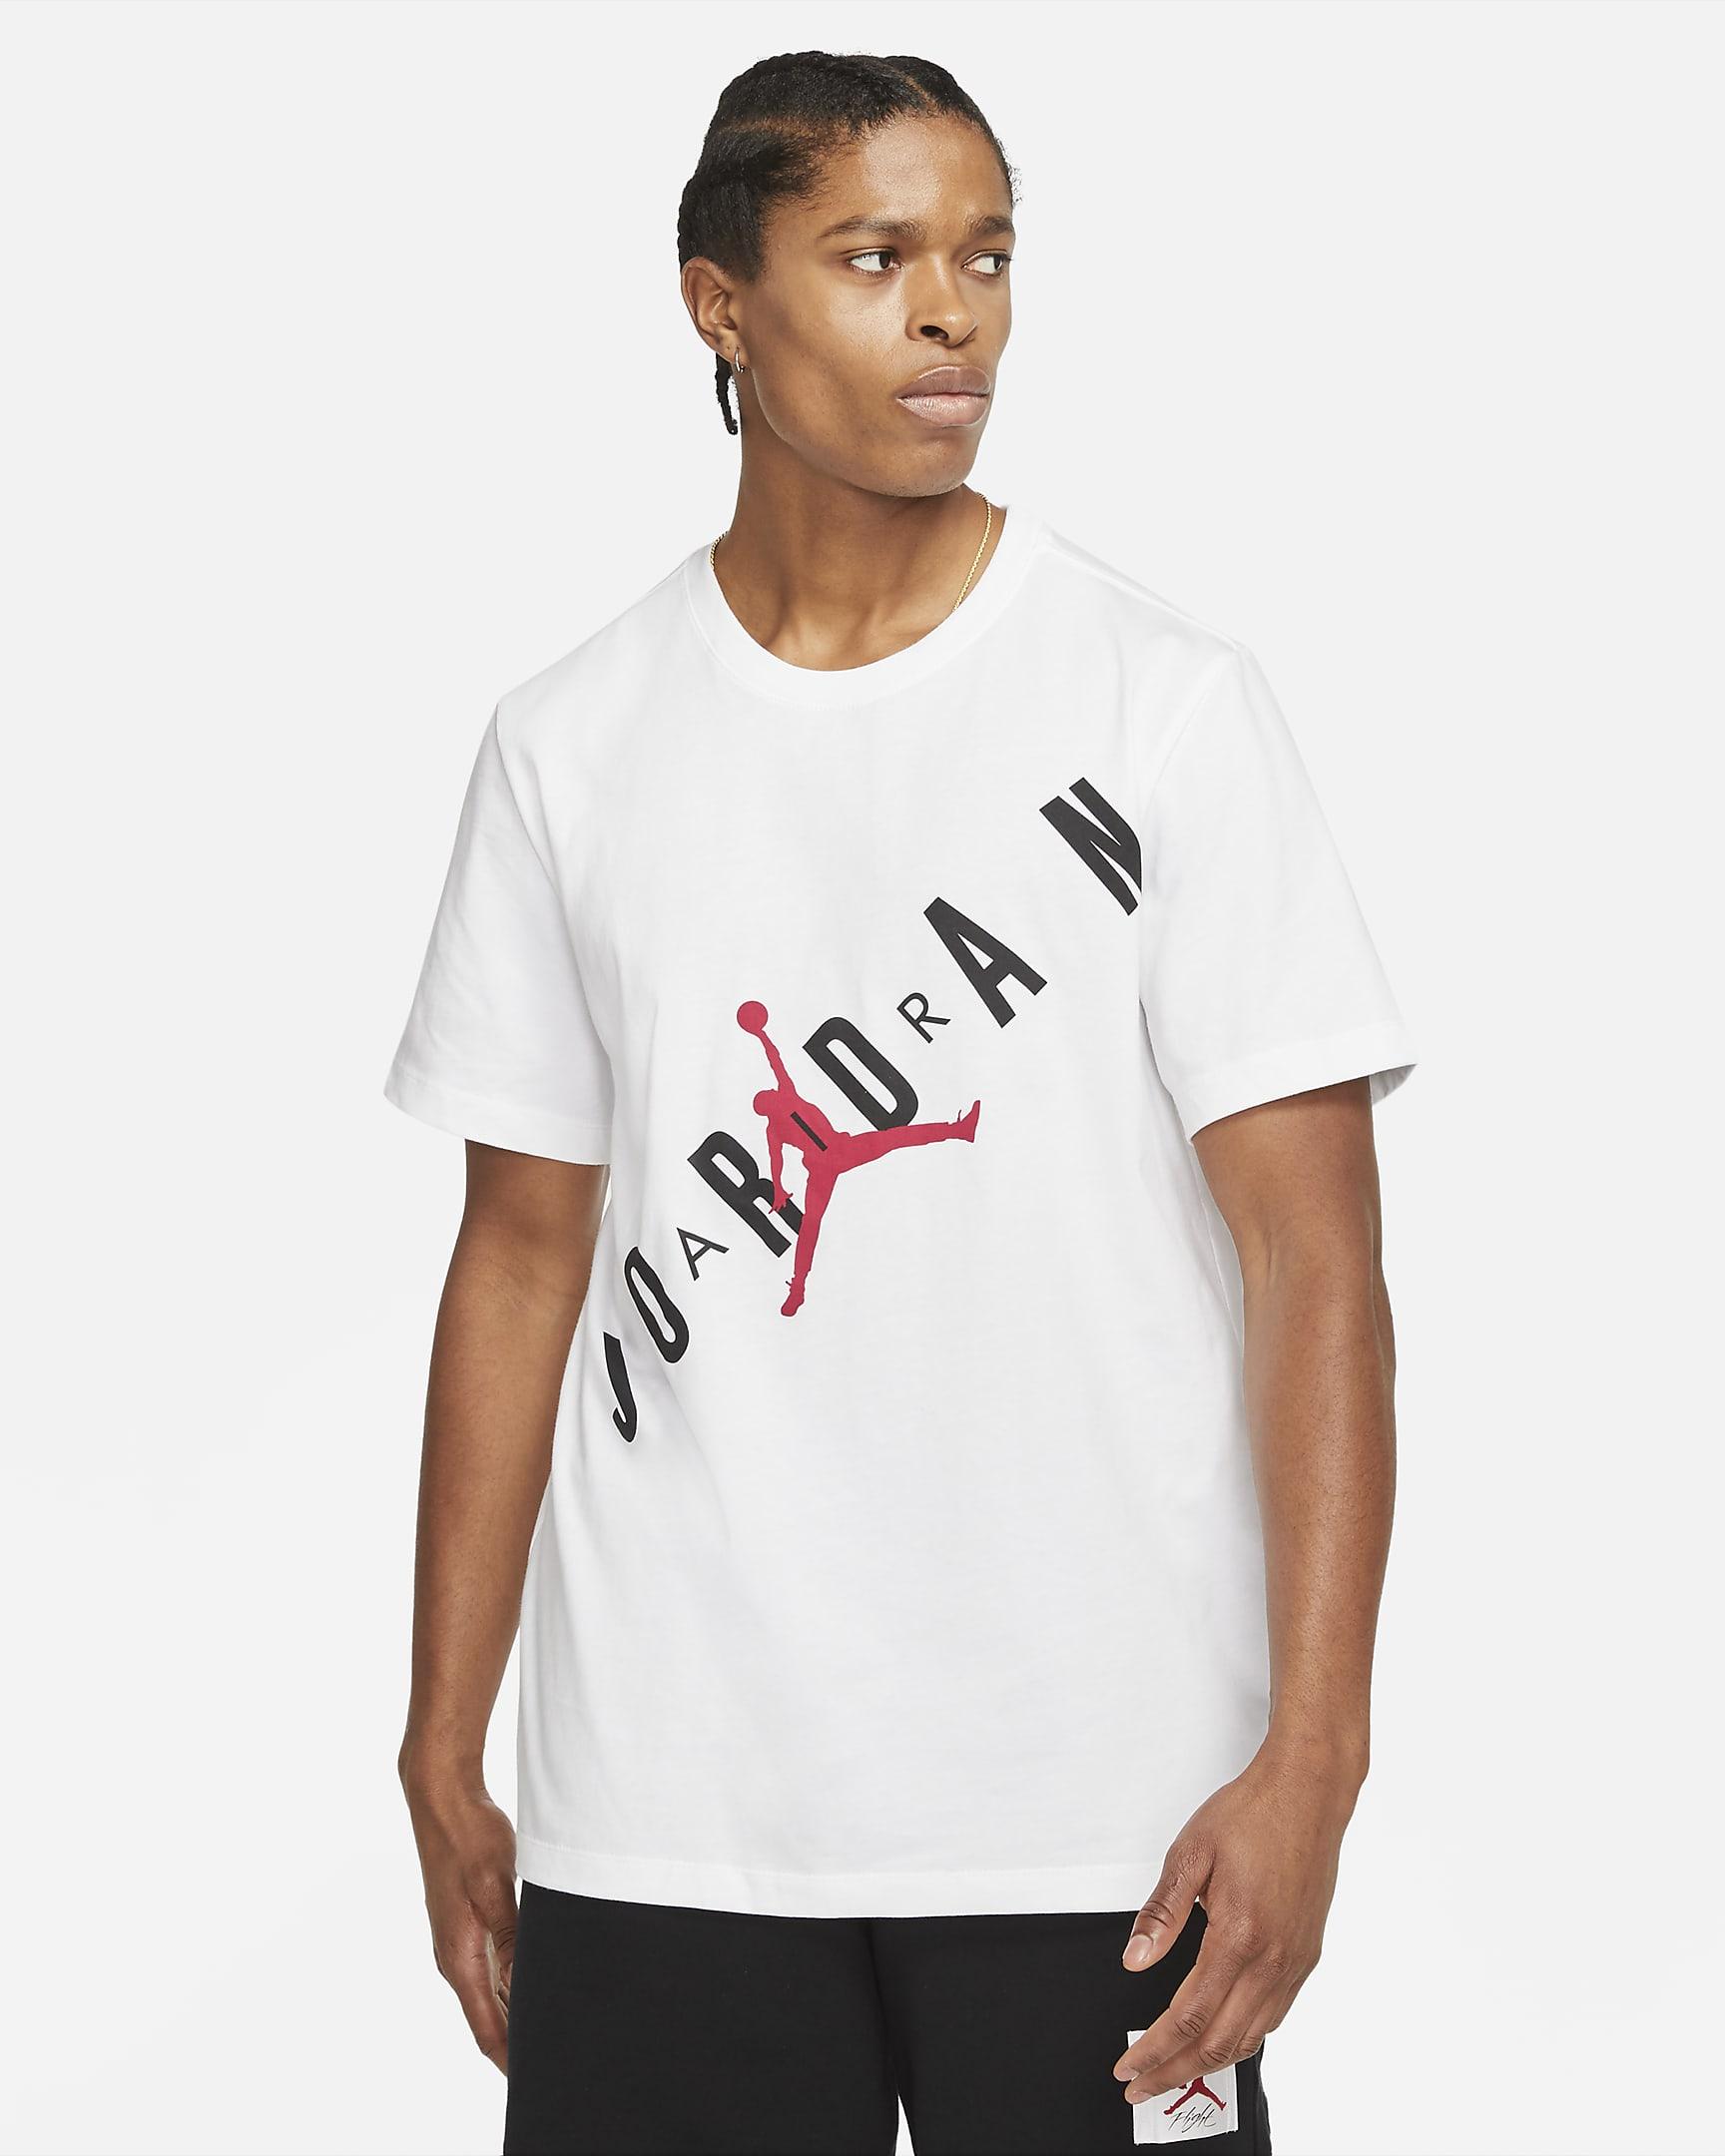 jordan-hbr-mens-short-sleeve-t-shirt-xLprvF